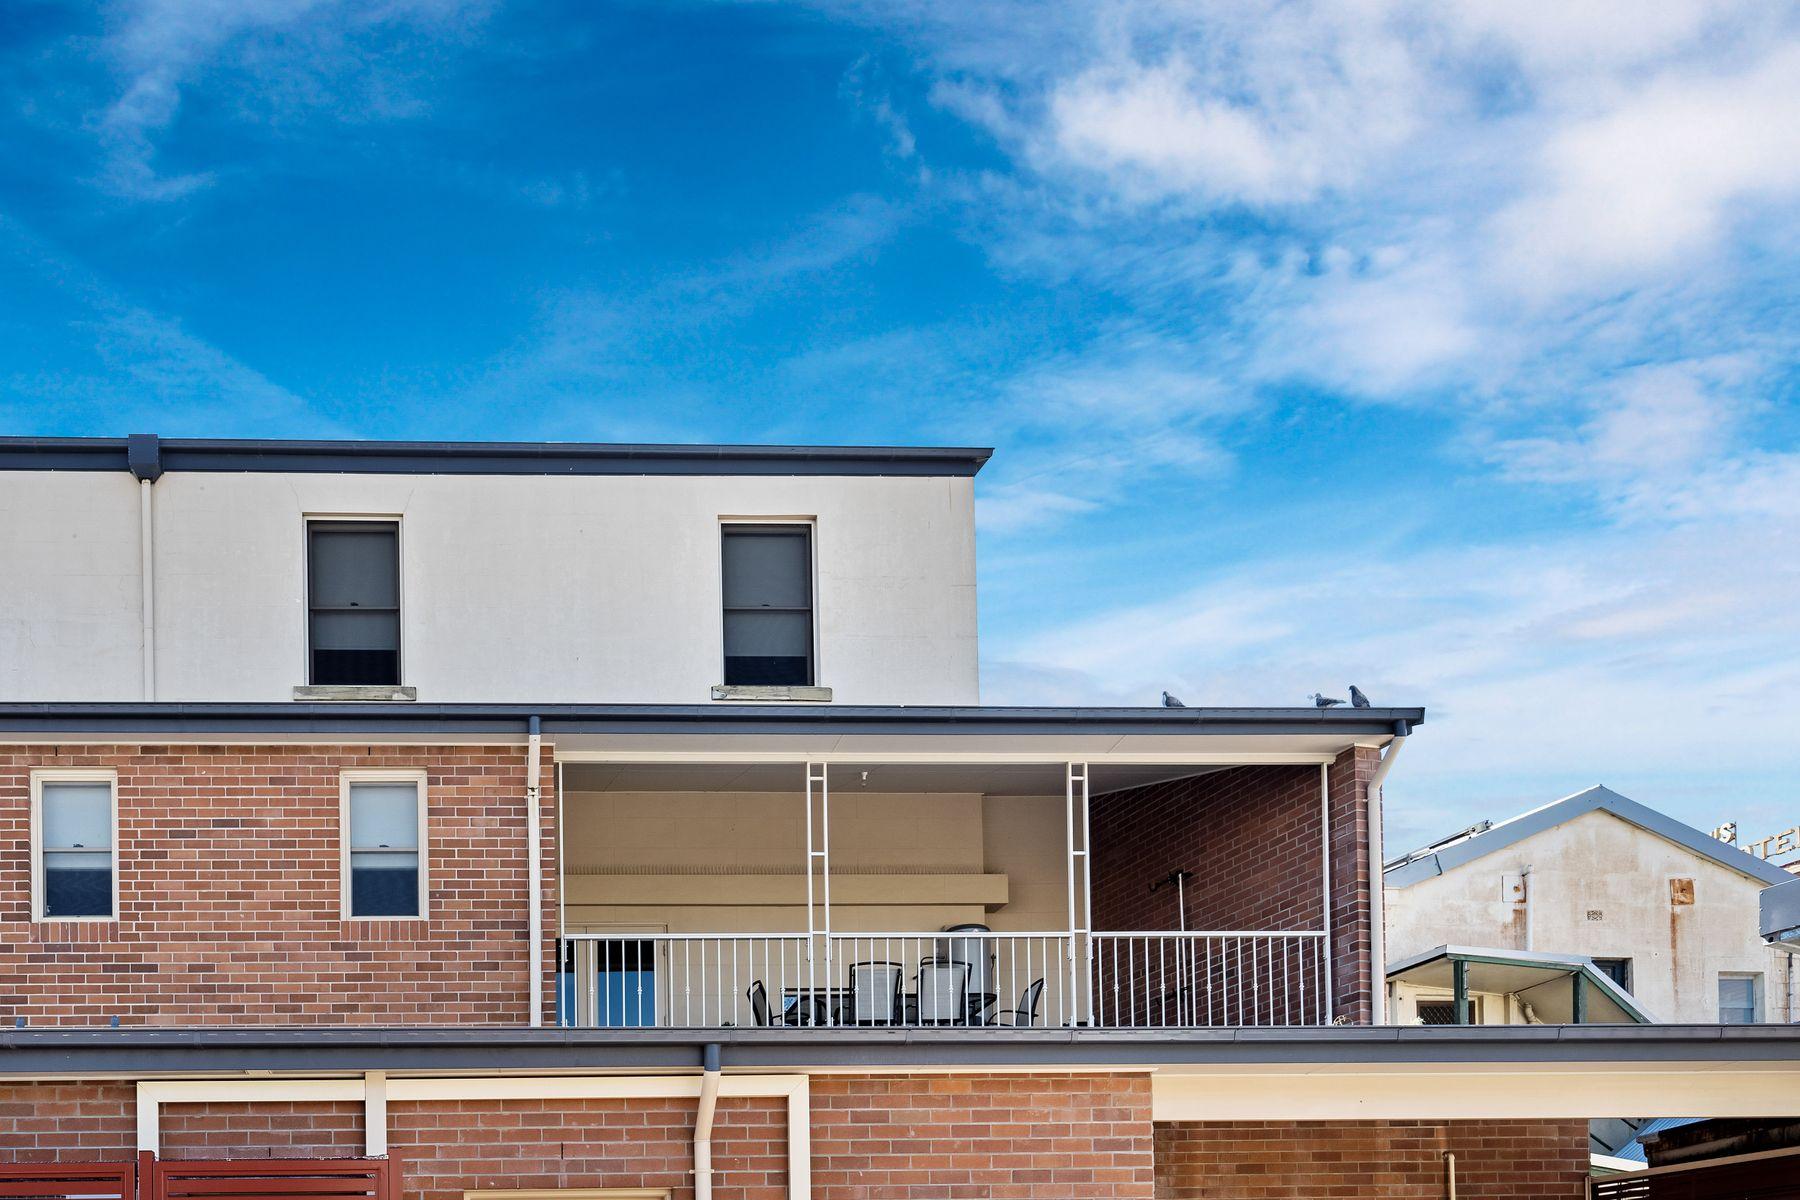 3/333 High Street, Maitland, NSW 2320